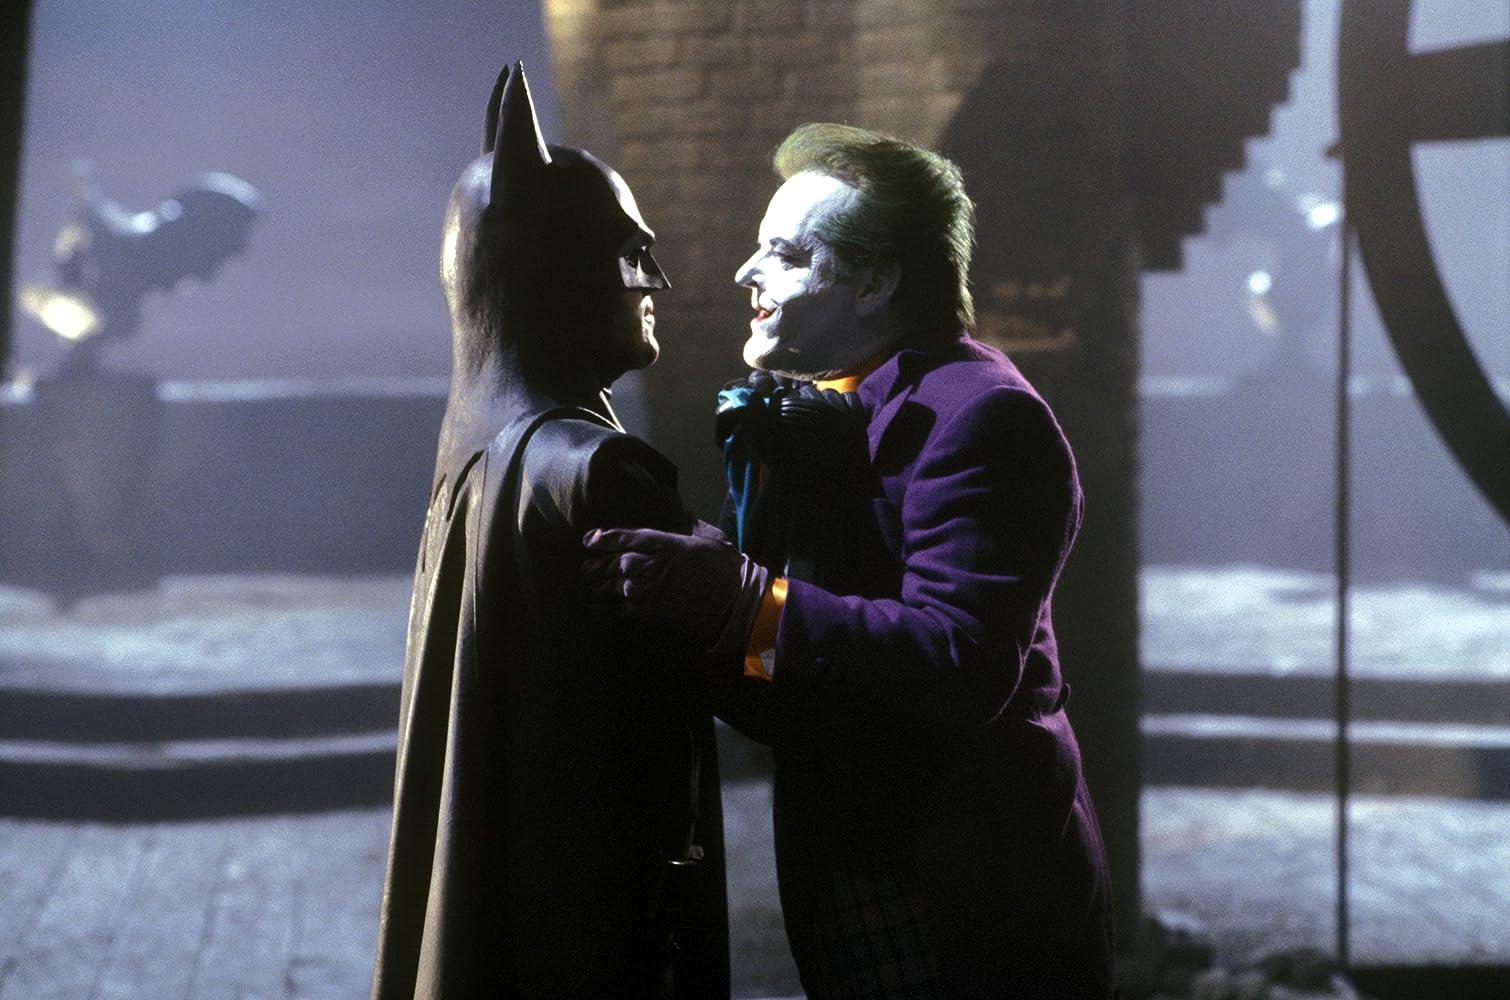 Jack Nicholson and Michael Keaton in Batman (1989)